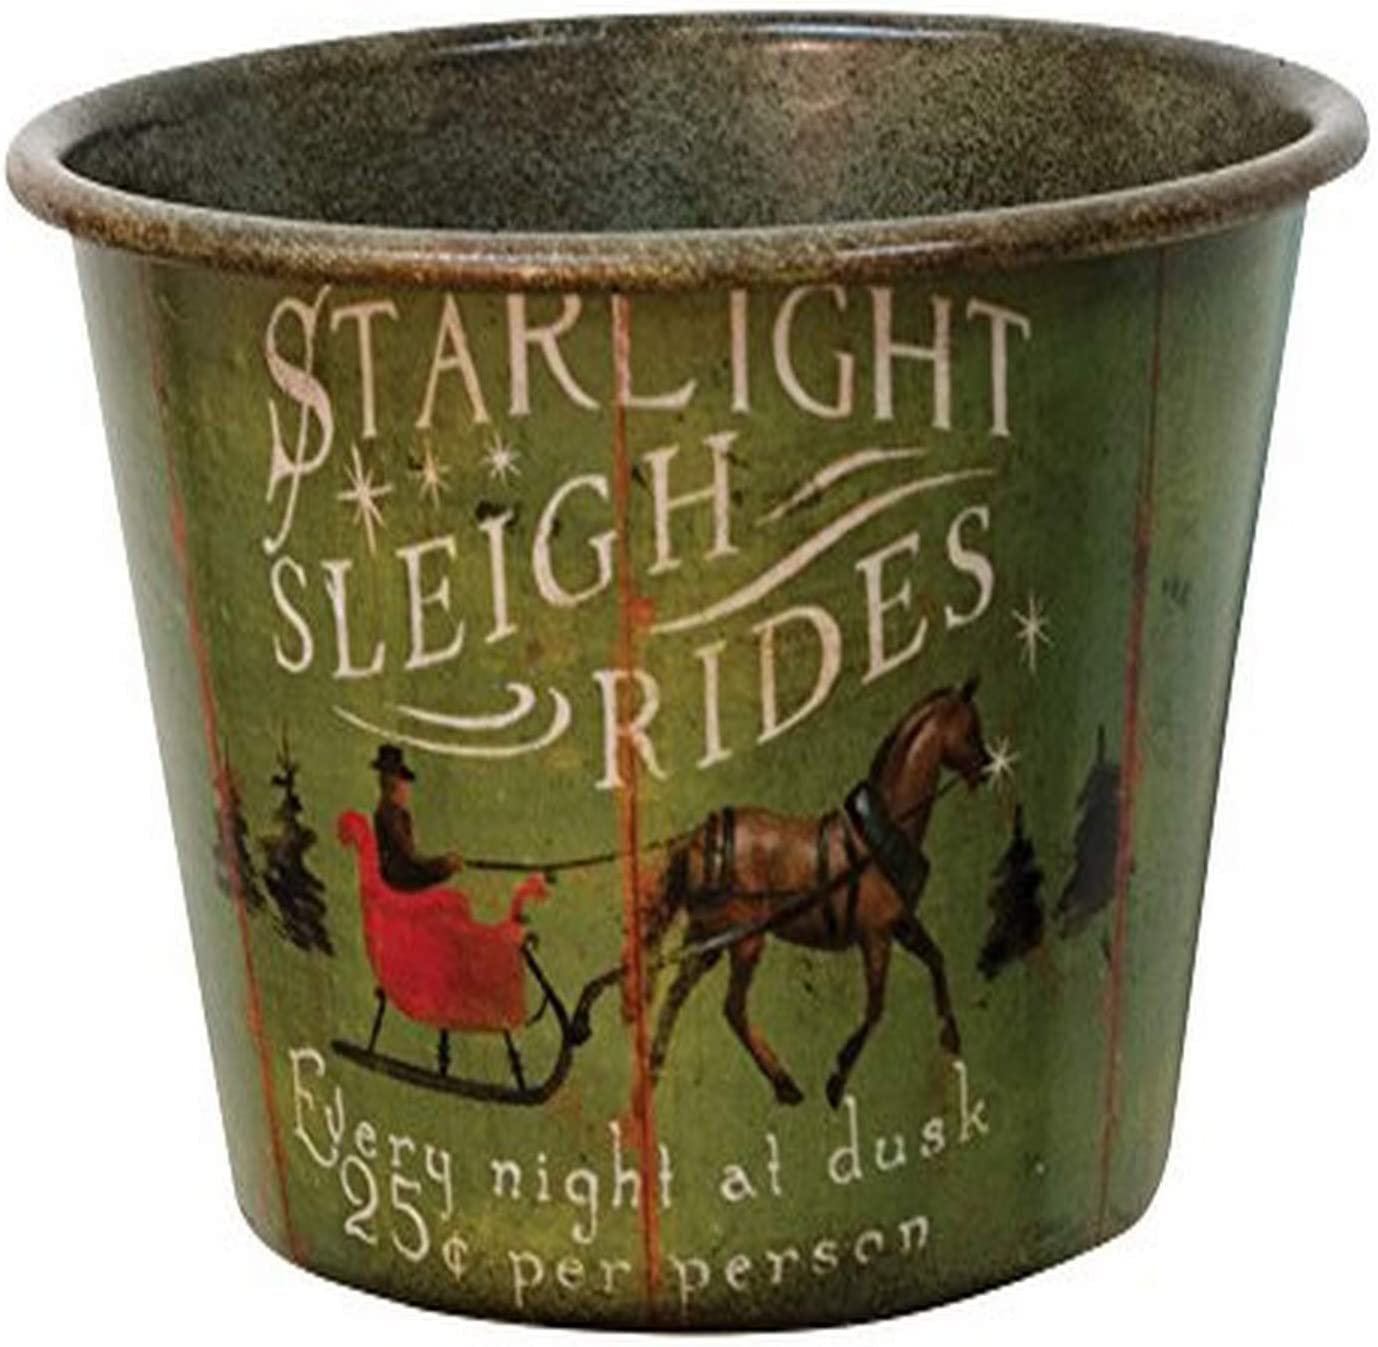 "CWI Gifts 4"" X 6.5"" Starlight Sleigh Rides Vintage Tin Bowl"